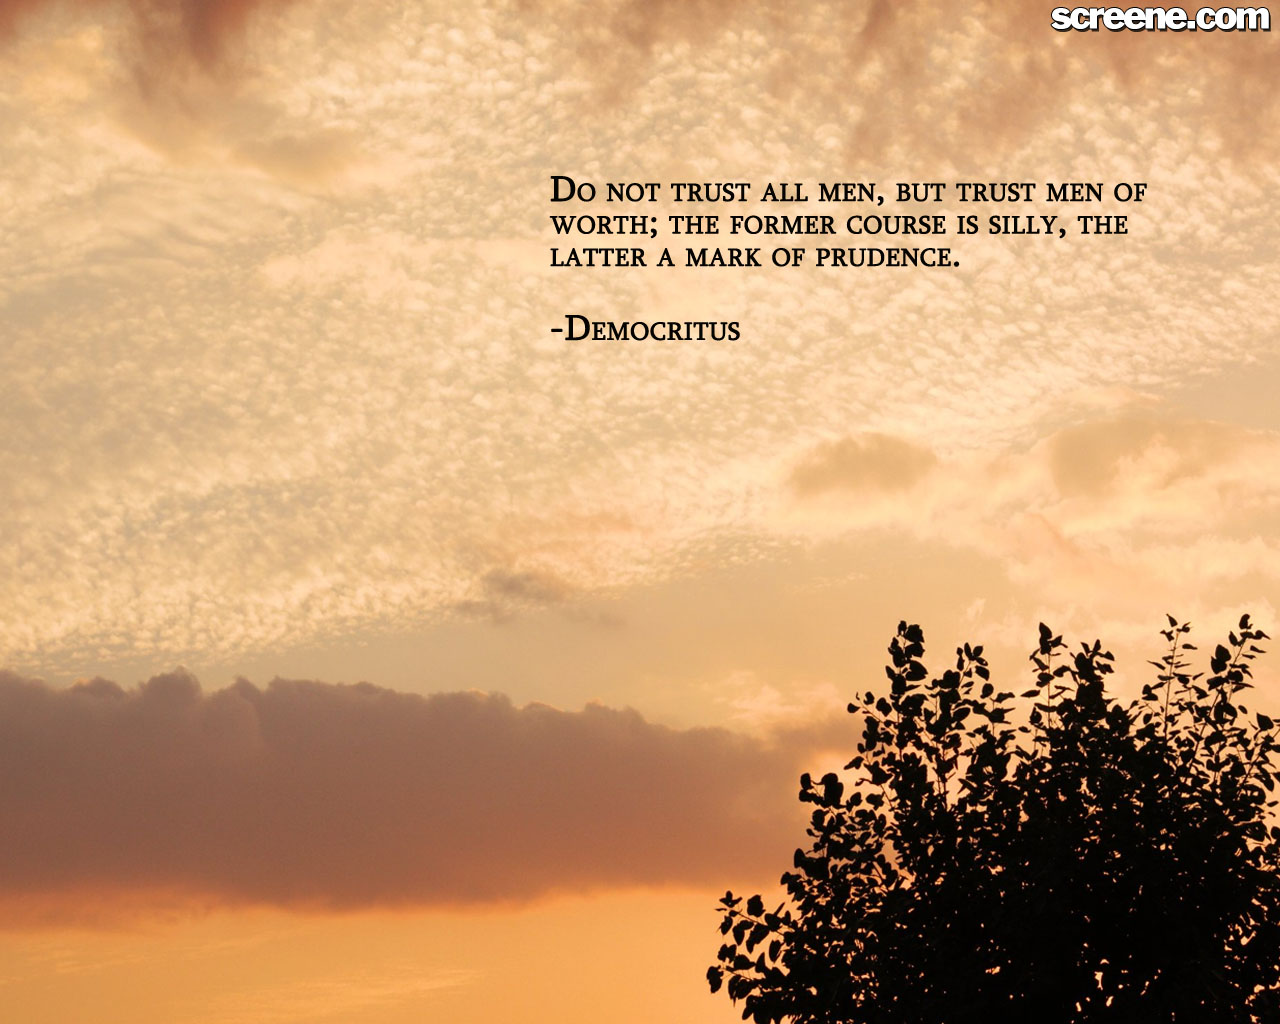 Trust Quotes And Sayings: Muhammad Nouman Ali Sheroz Awais Iqbal Talha Mohsin Riaz